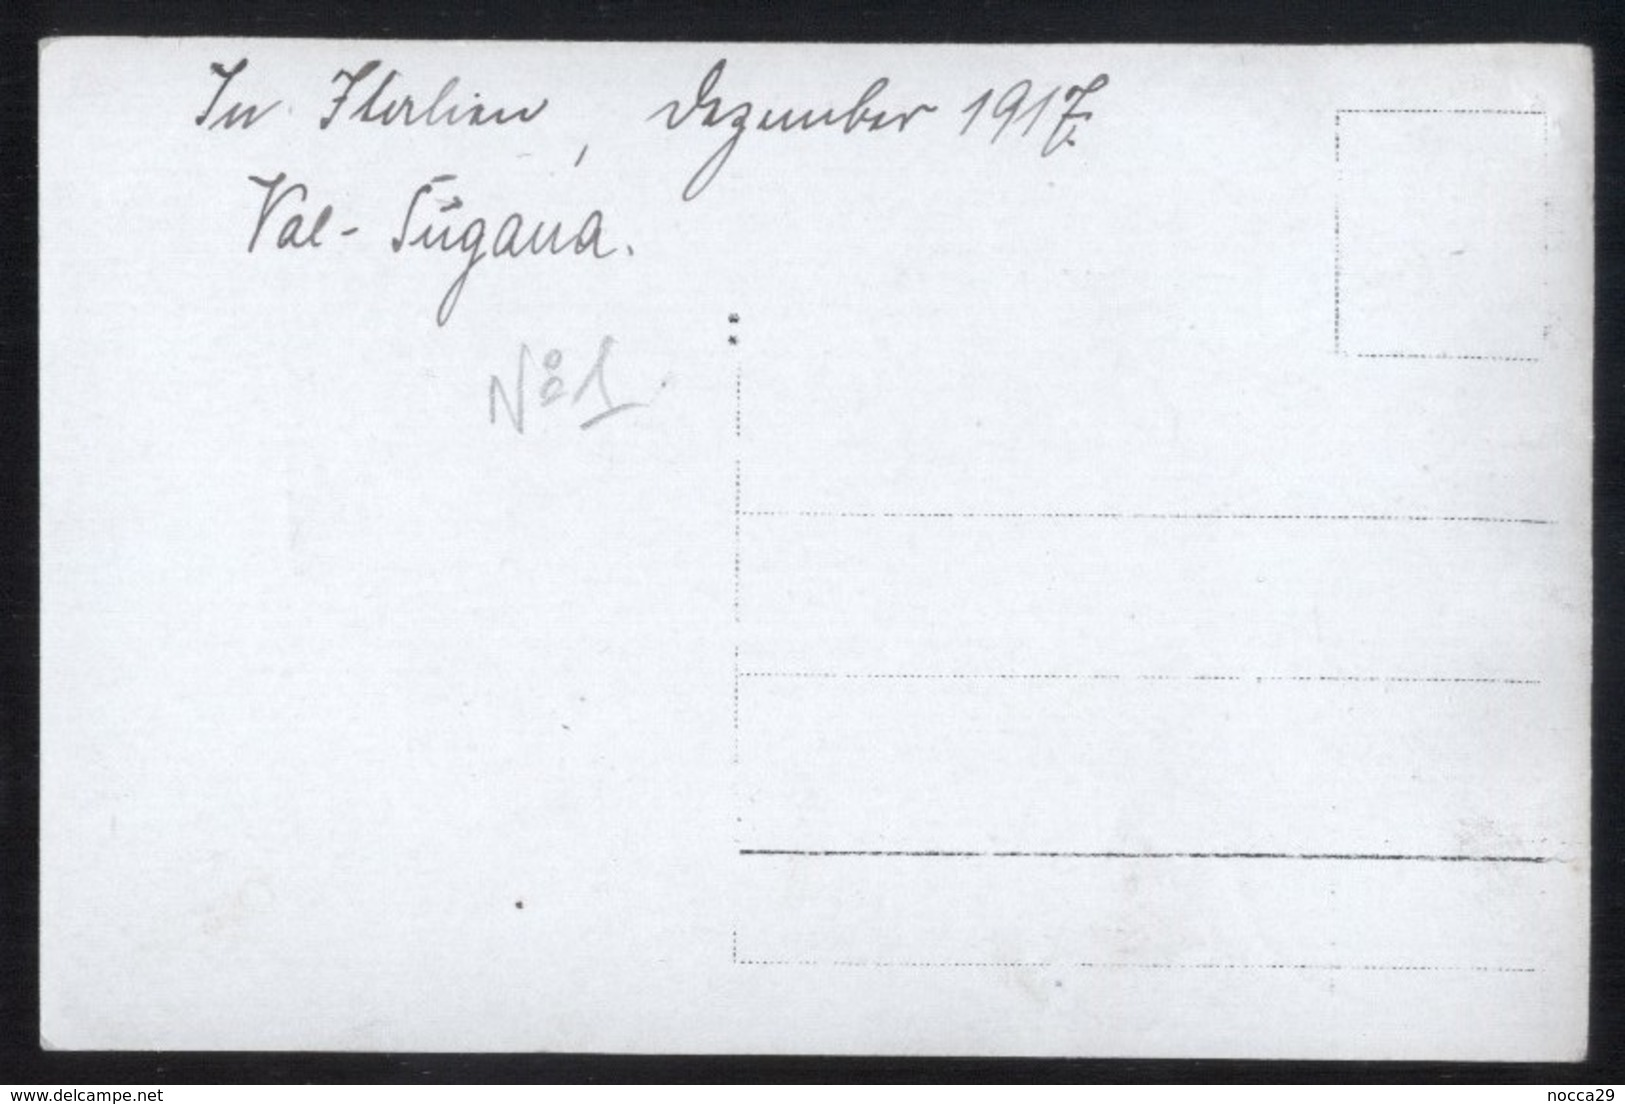 FOTOCARTOLINA MILITARE 1917 VALSUGANA TRENTO BORGO LEVICO CALDONAZZO RONCEGNO ( N°1) UNICA!!! - Trento